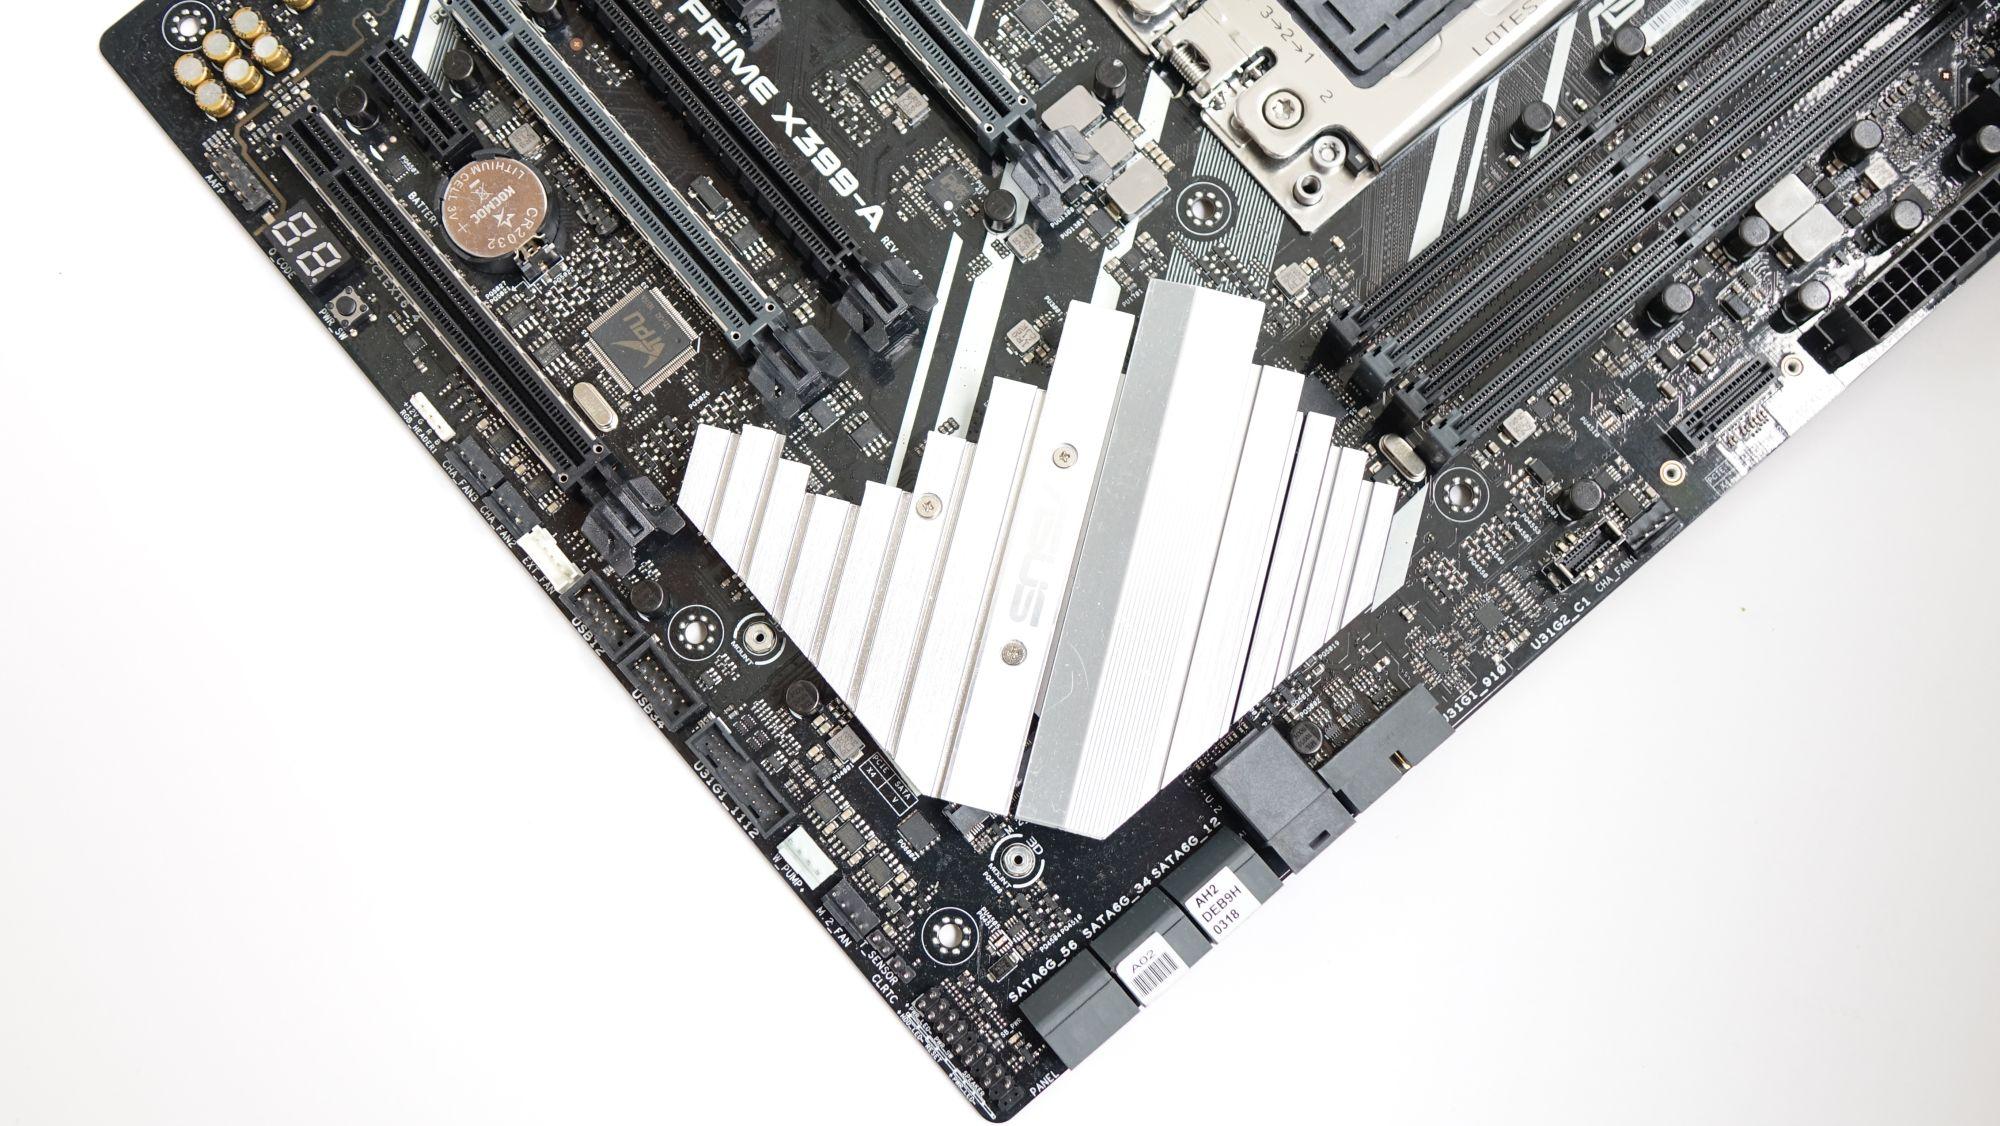 ASUS Prime X399-A chipset